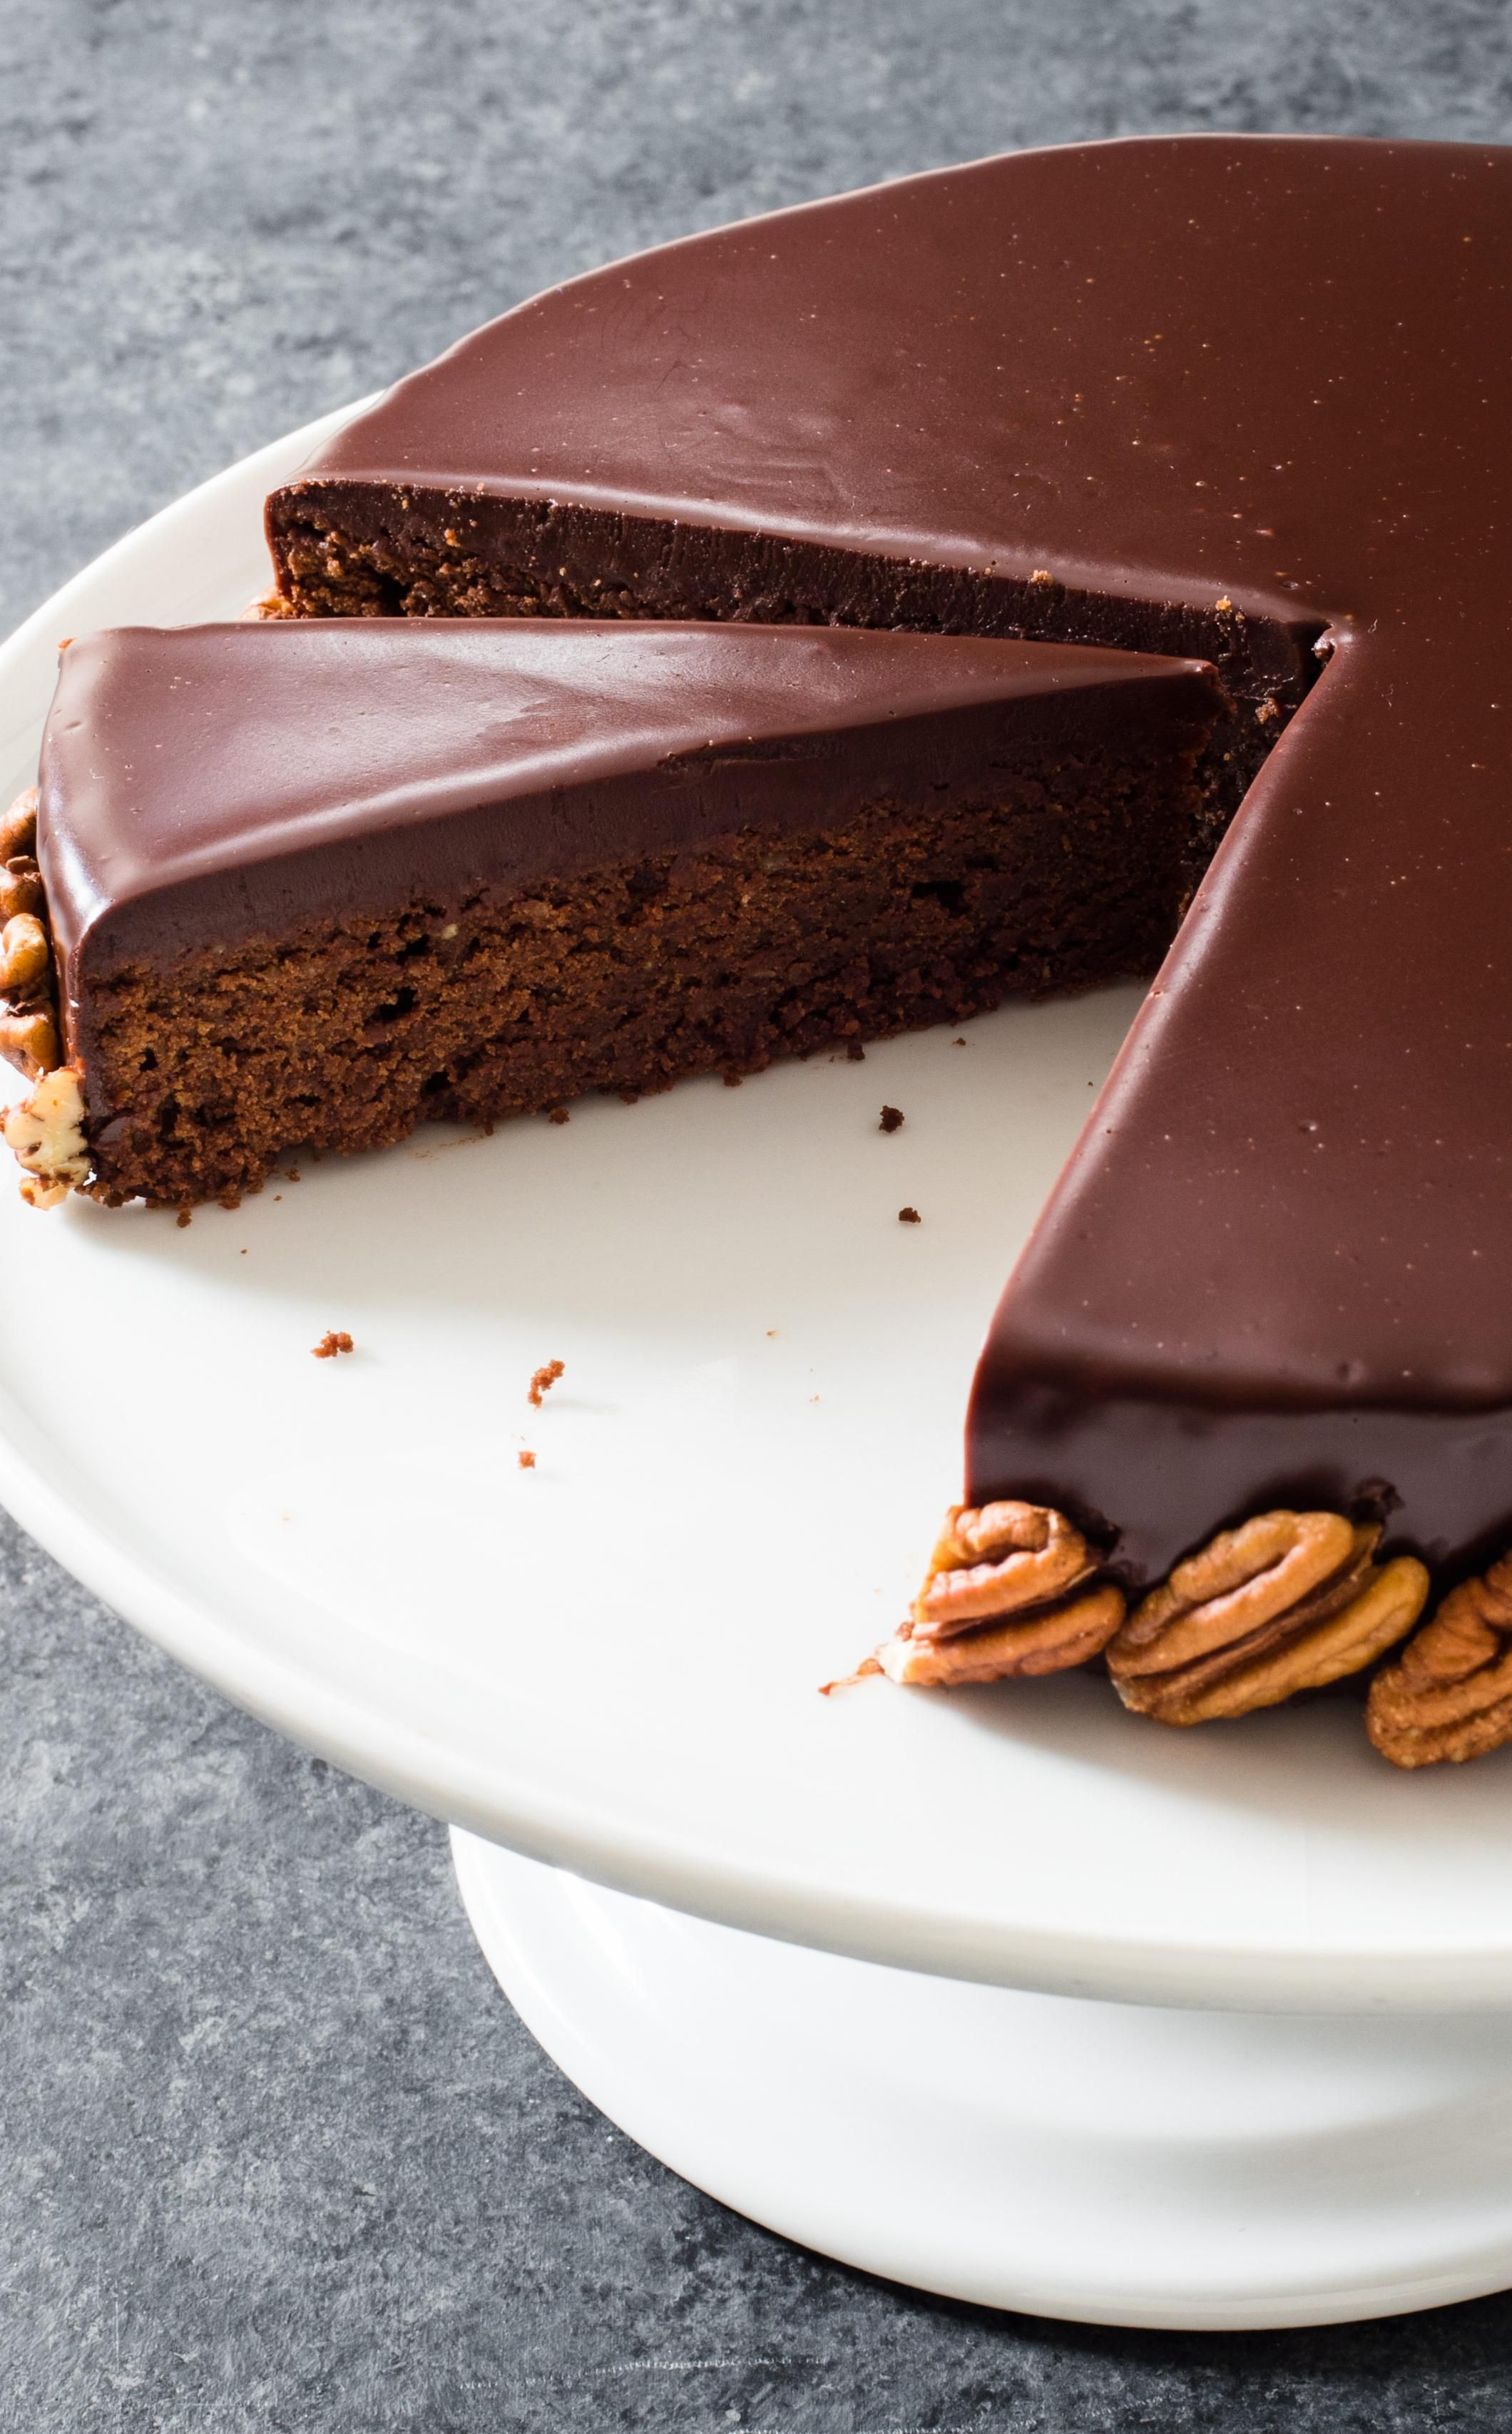 Chocolatepecan torte with chocolate glaze the